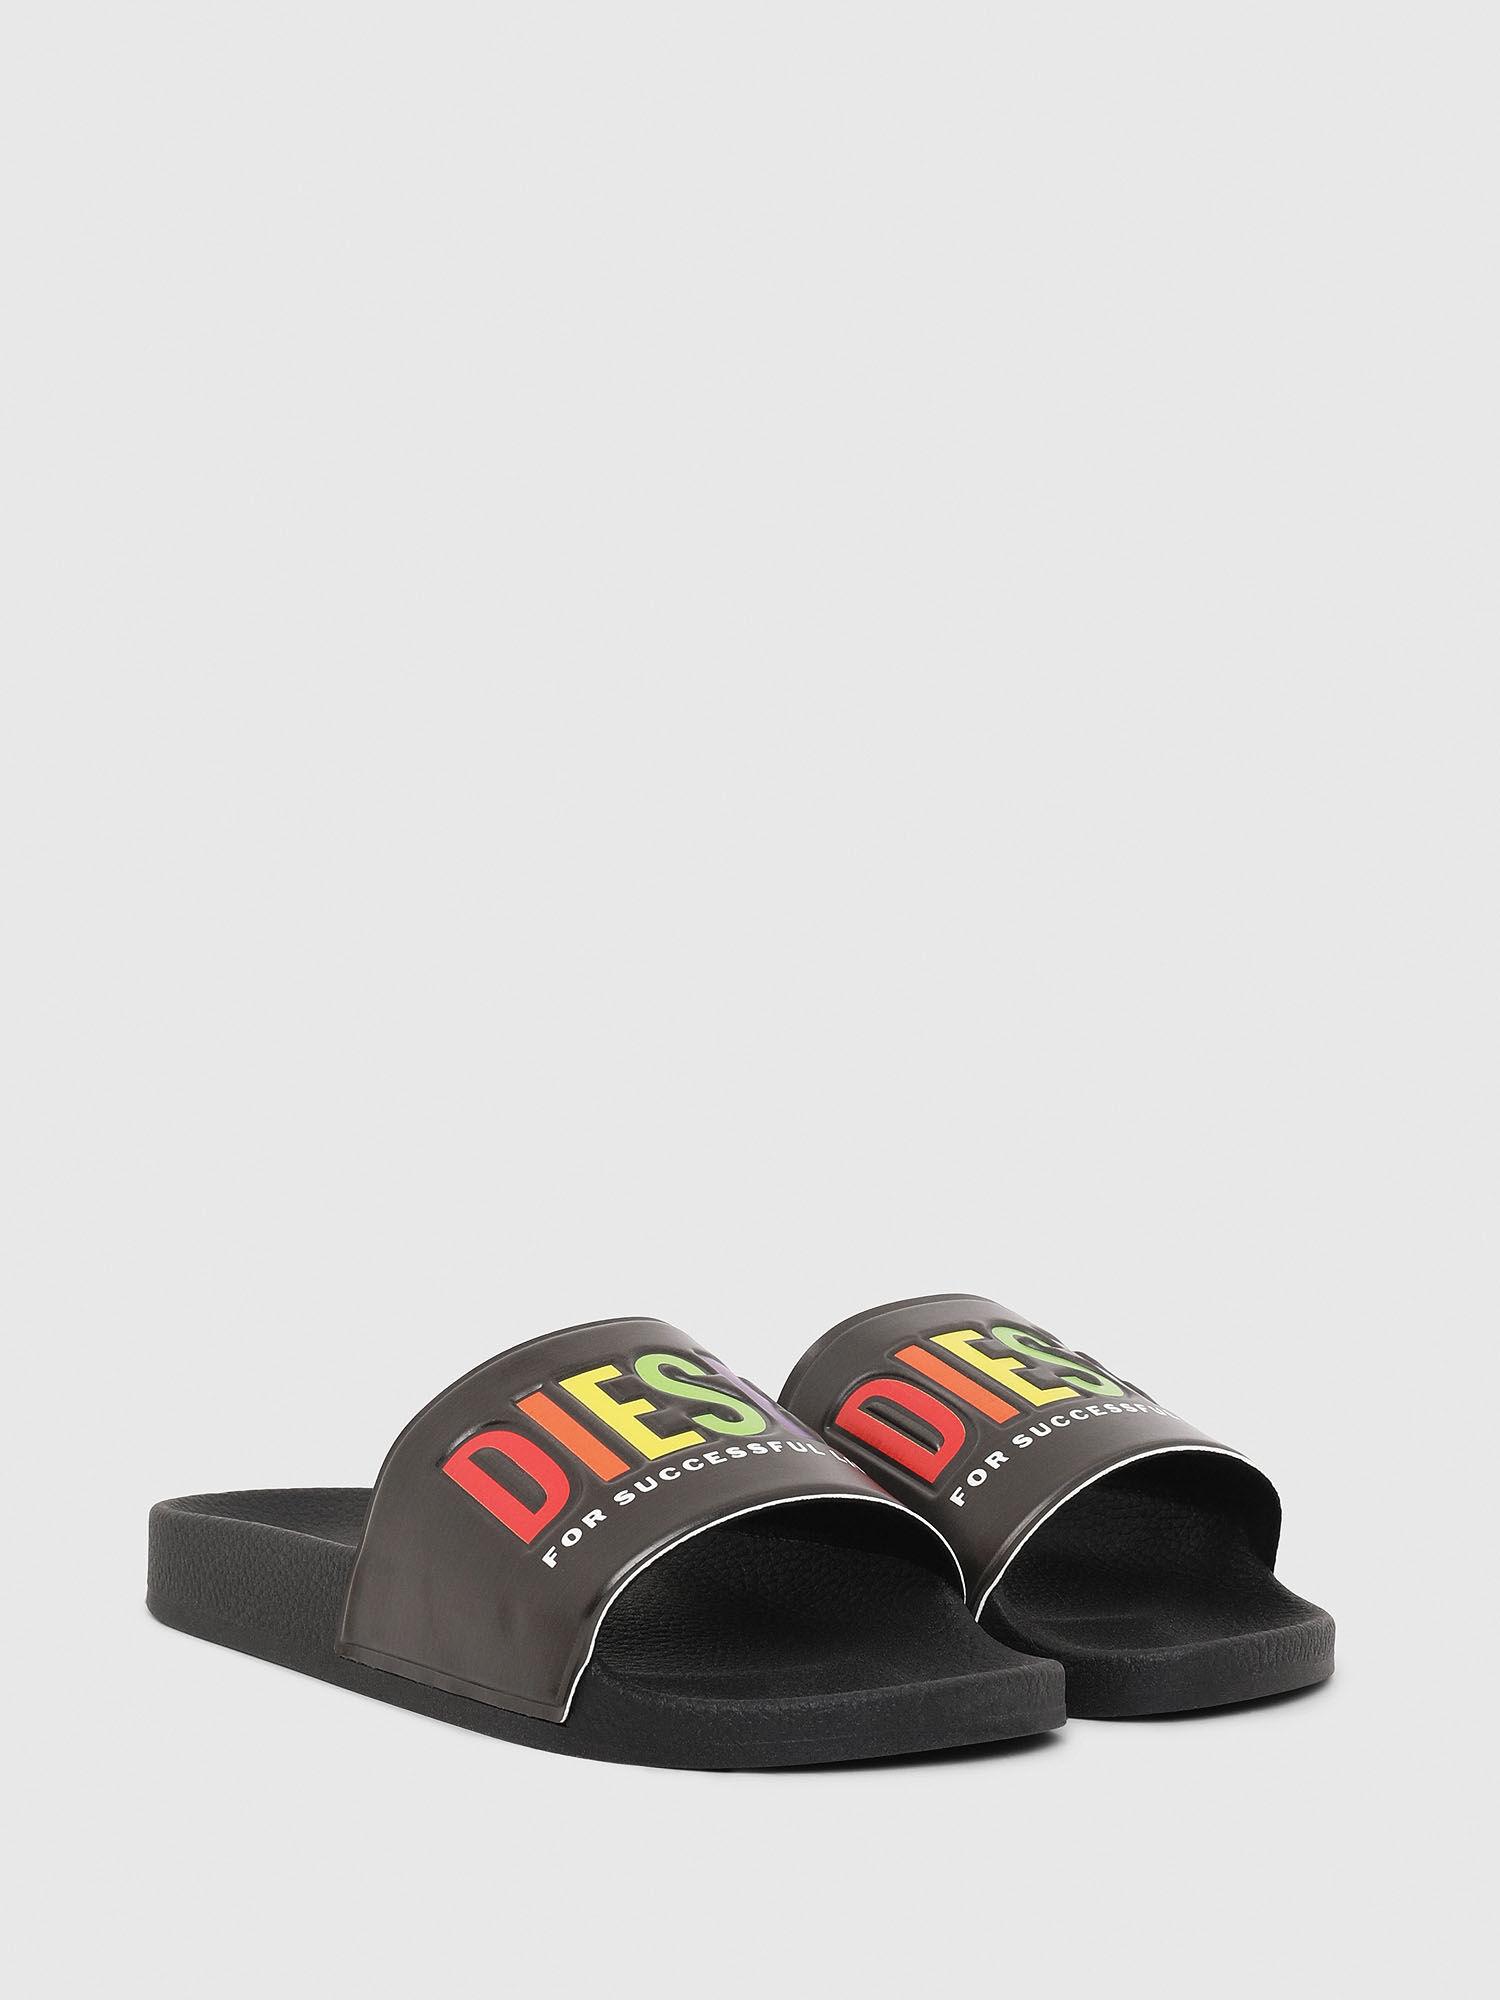 Diesel Womens Slide Sandal